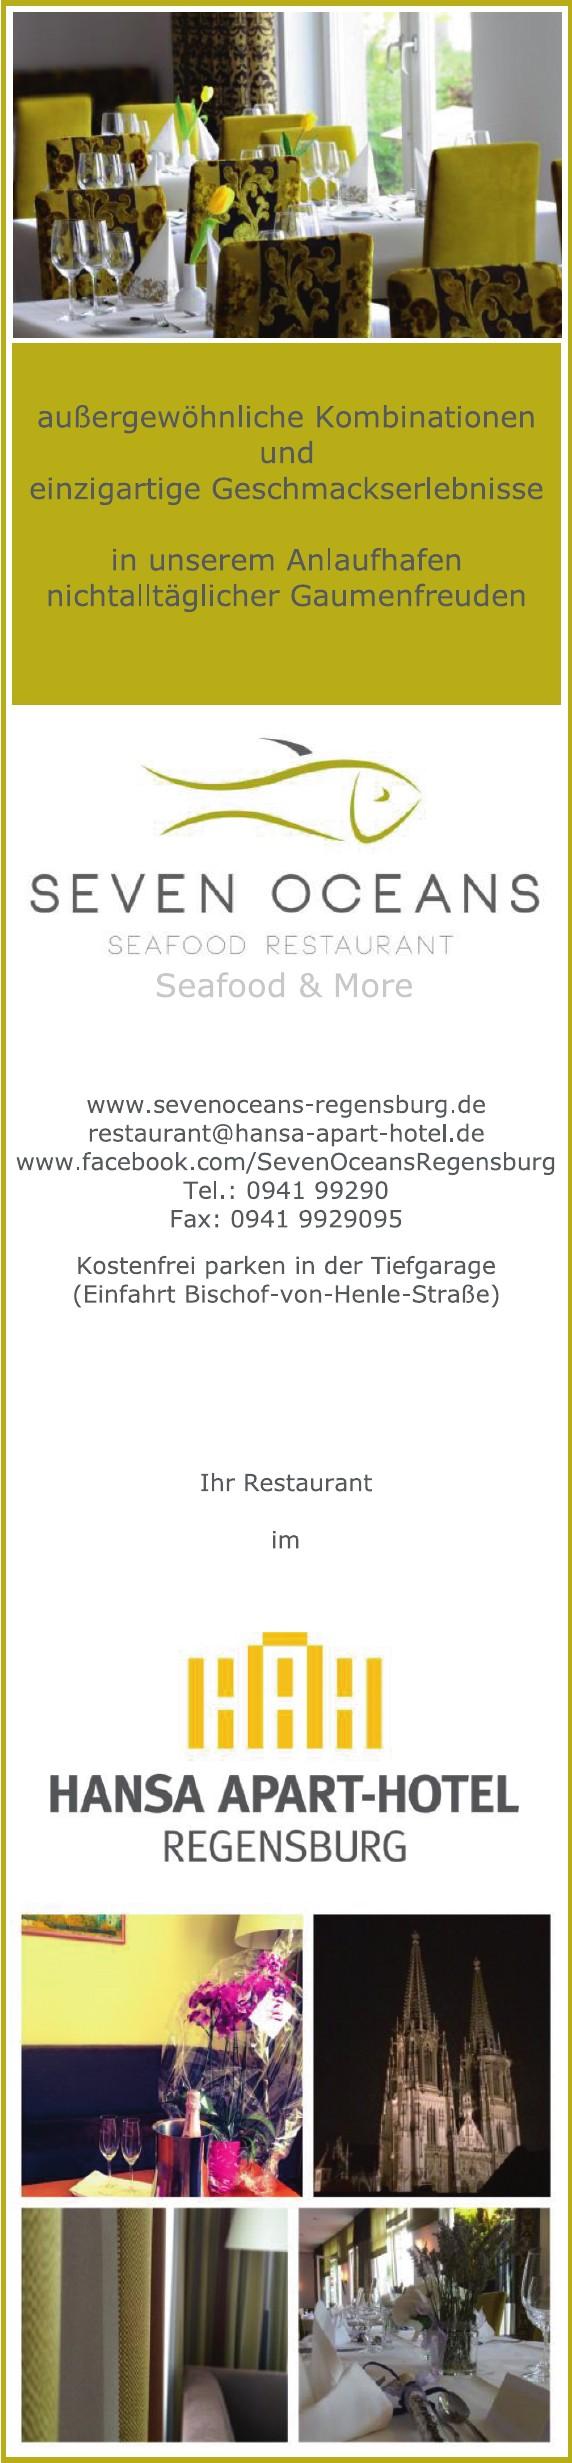 Seven Oceans Seafood Restaurant